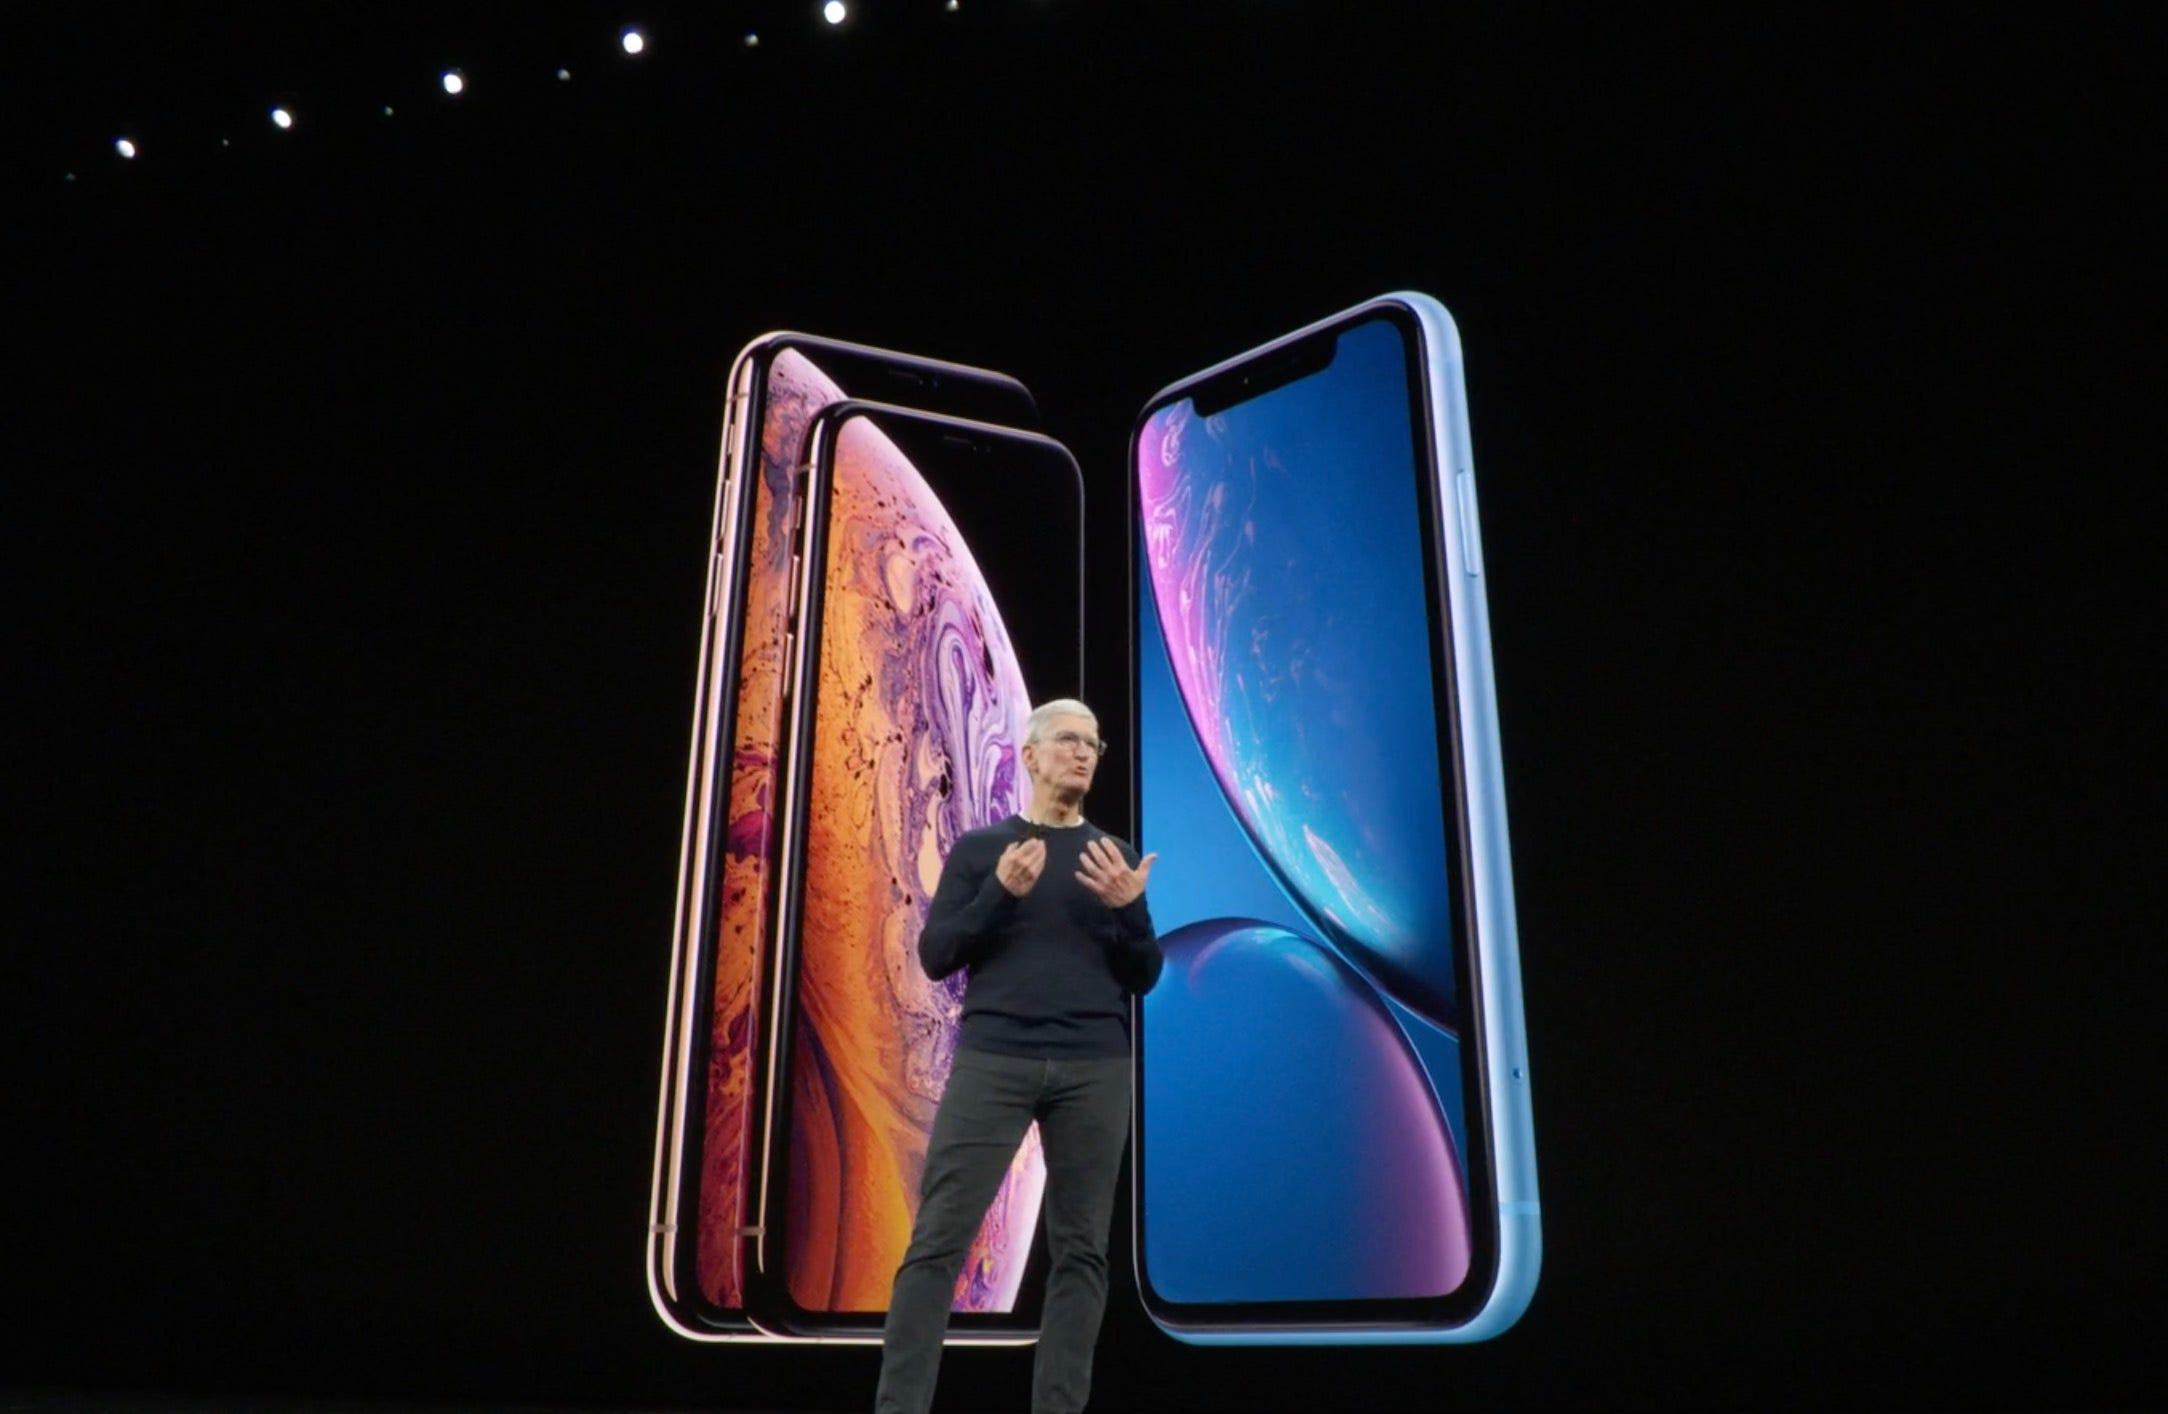 Apple TV+ entertainment service launches Nov. 1